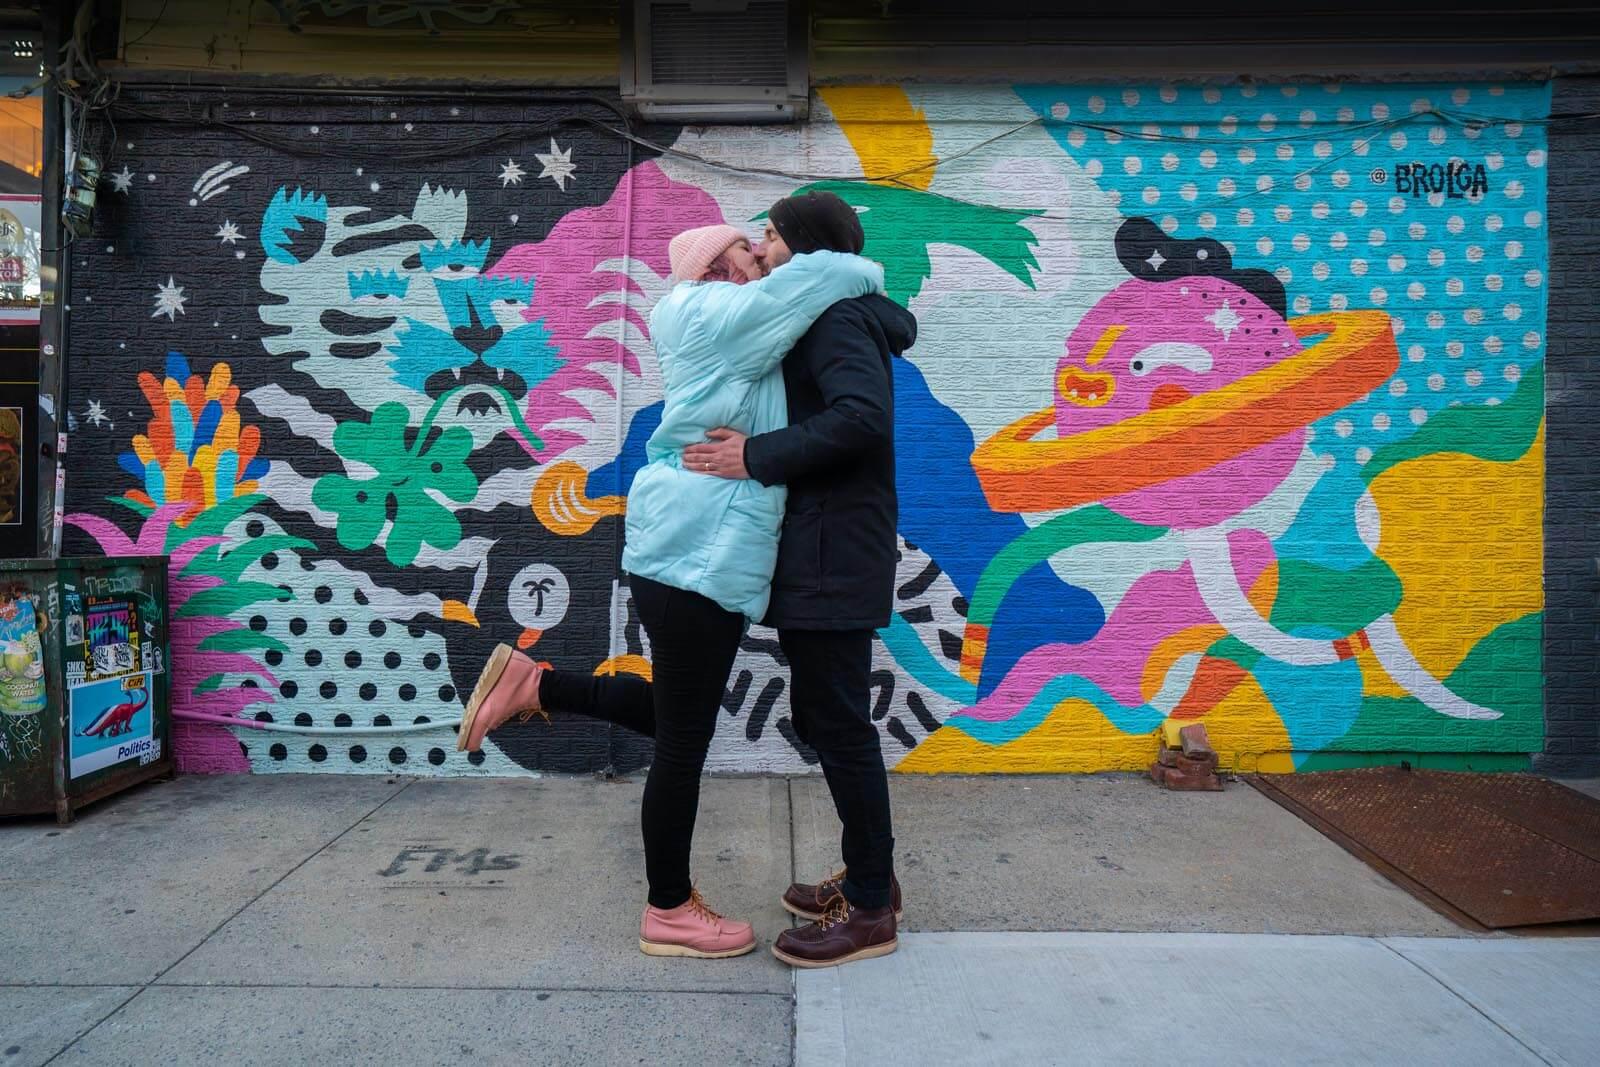 kissing in front of the Brolga mural in Williamsburg Brooklyn